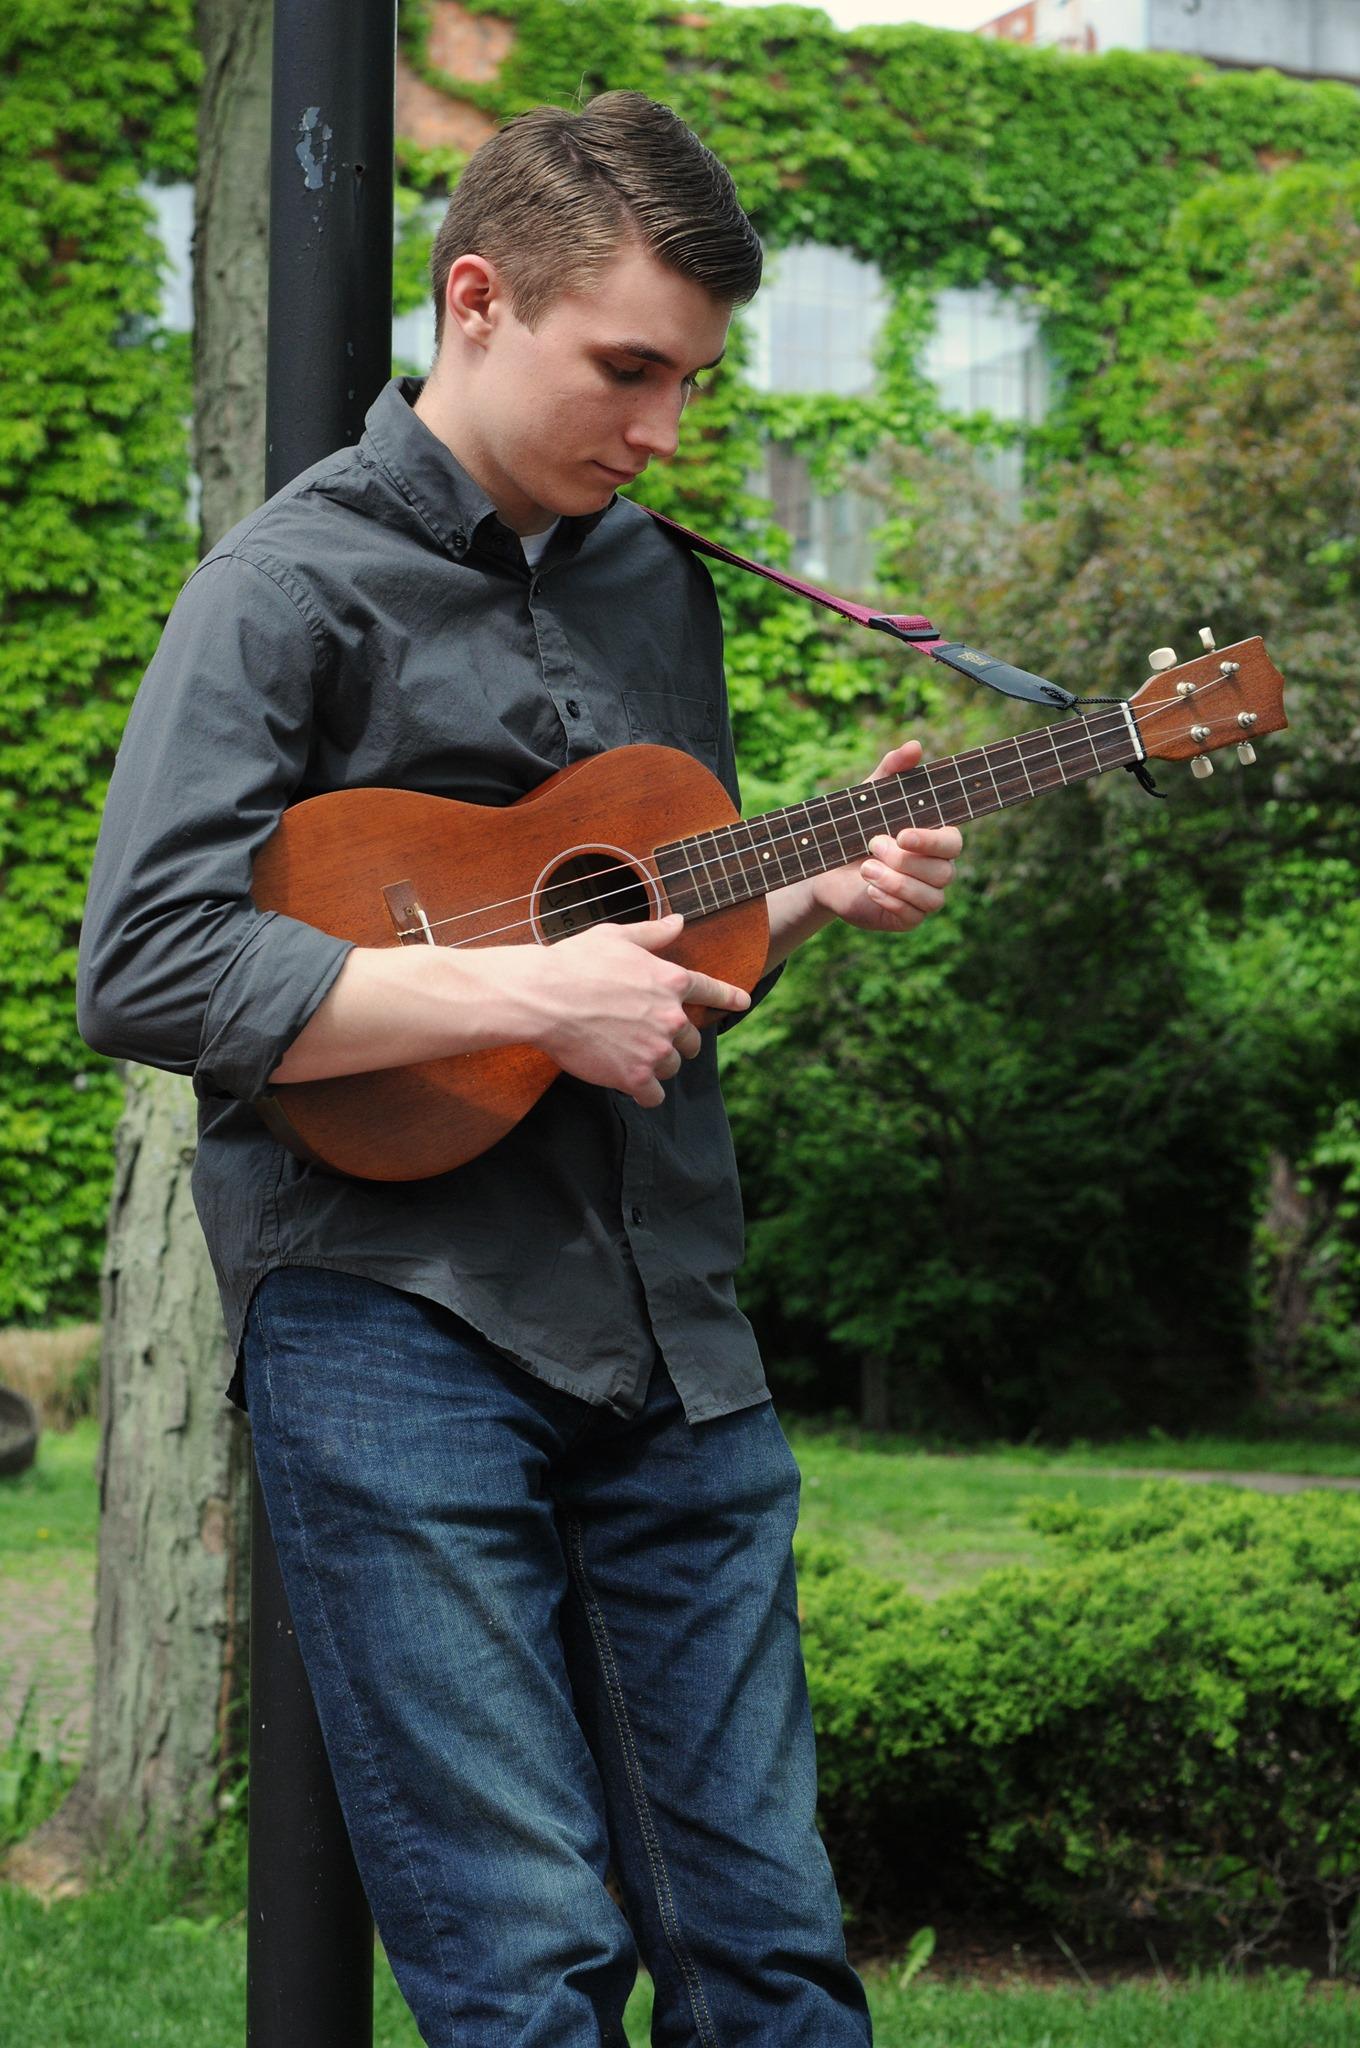 Ethan Howell